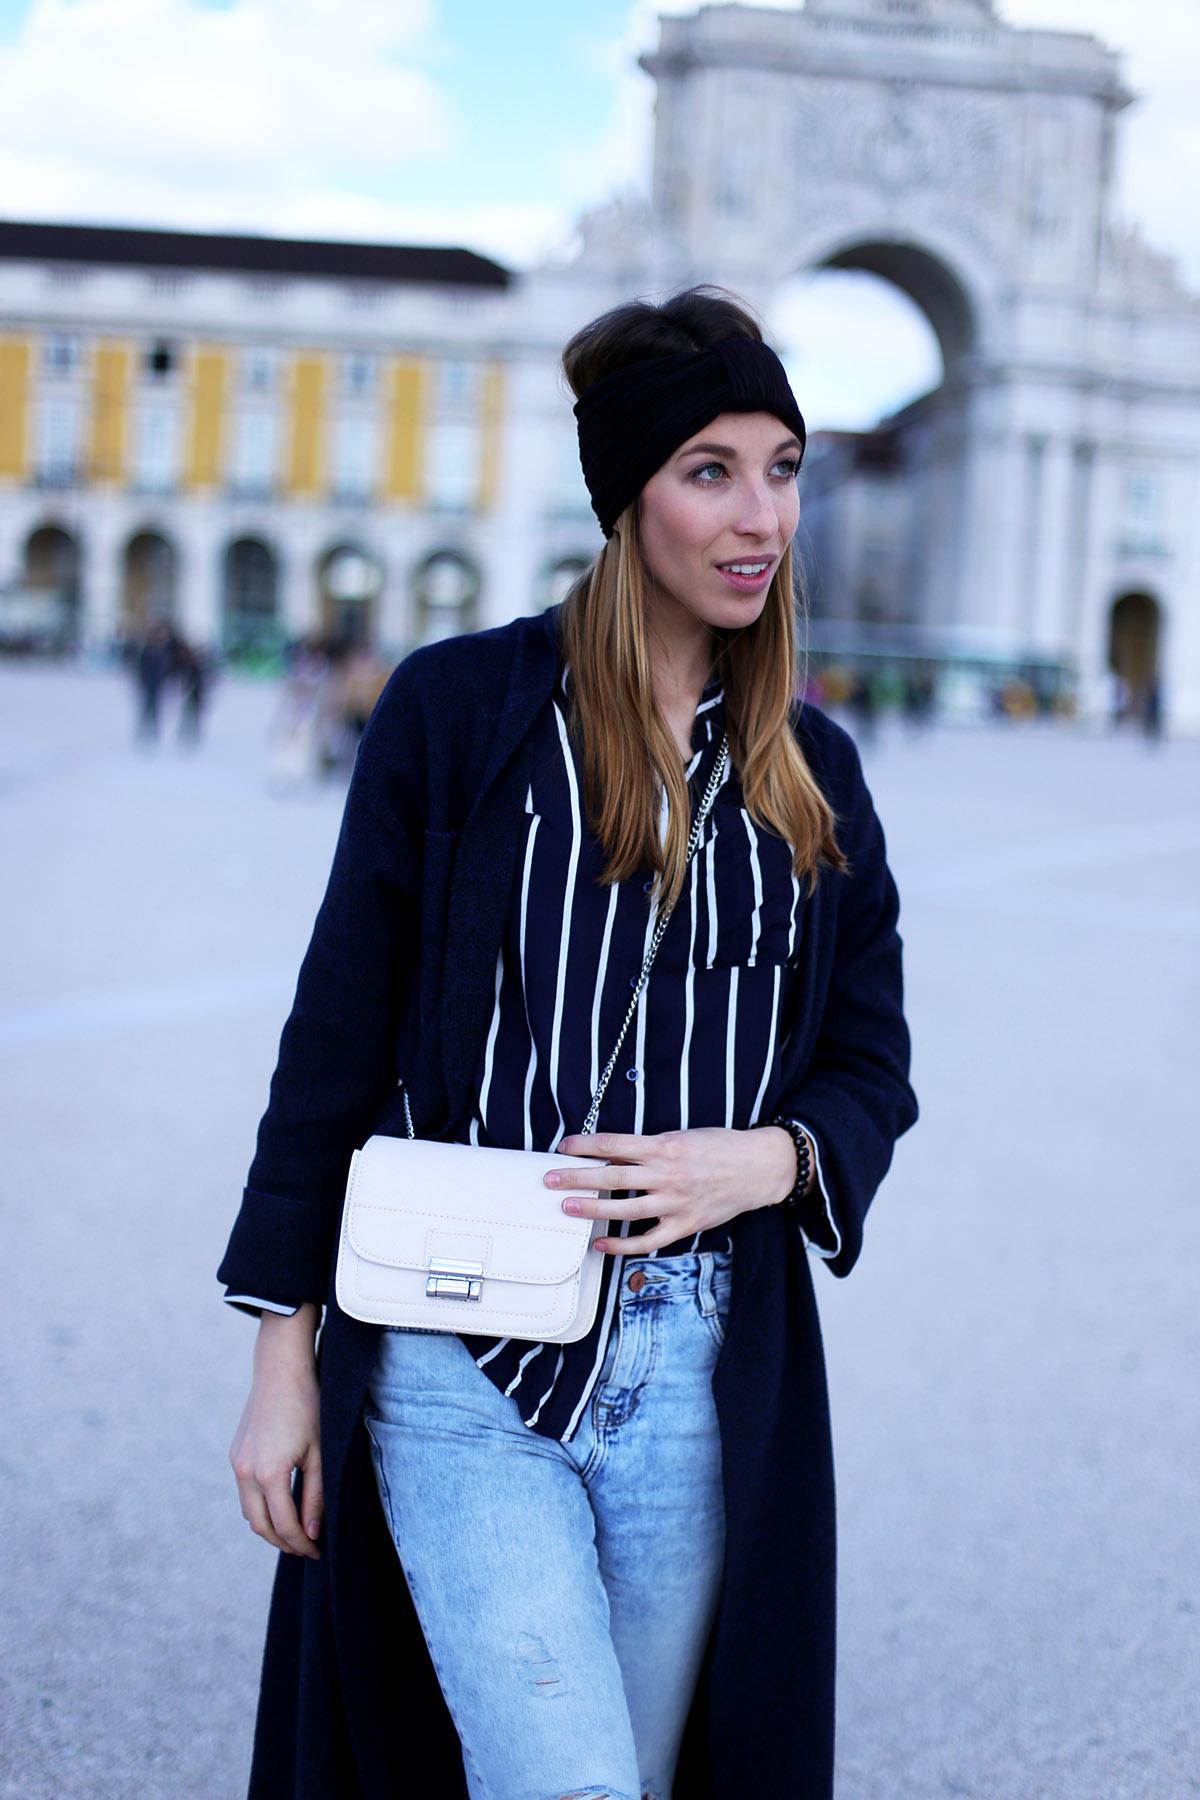 Liebreizend-Fashionblog-Innsbruck-Lissabon-Boyfriend-Jeans-Oversized-Mantel-Outfit-Haarband